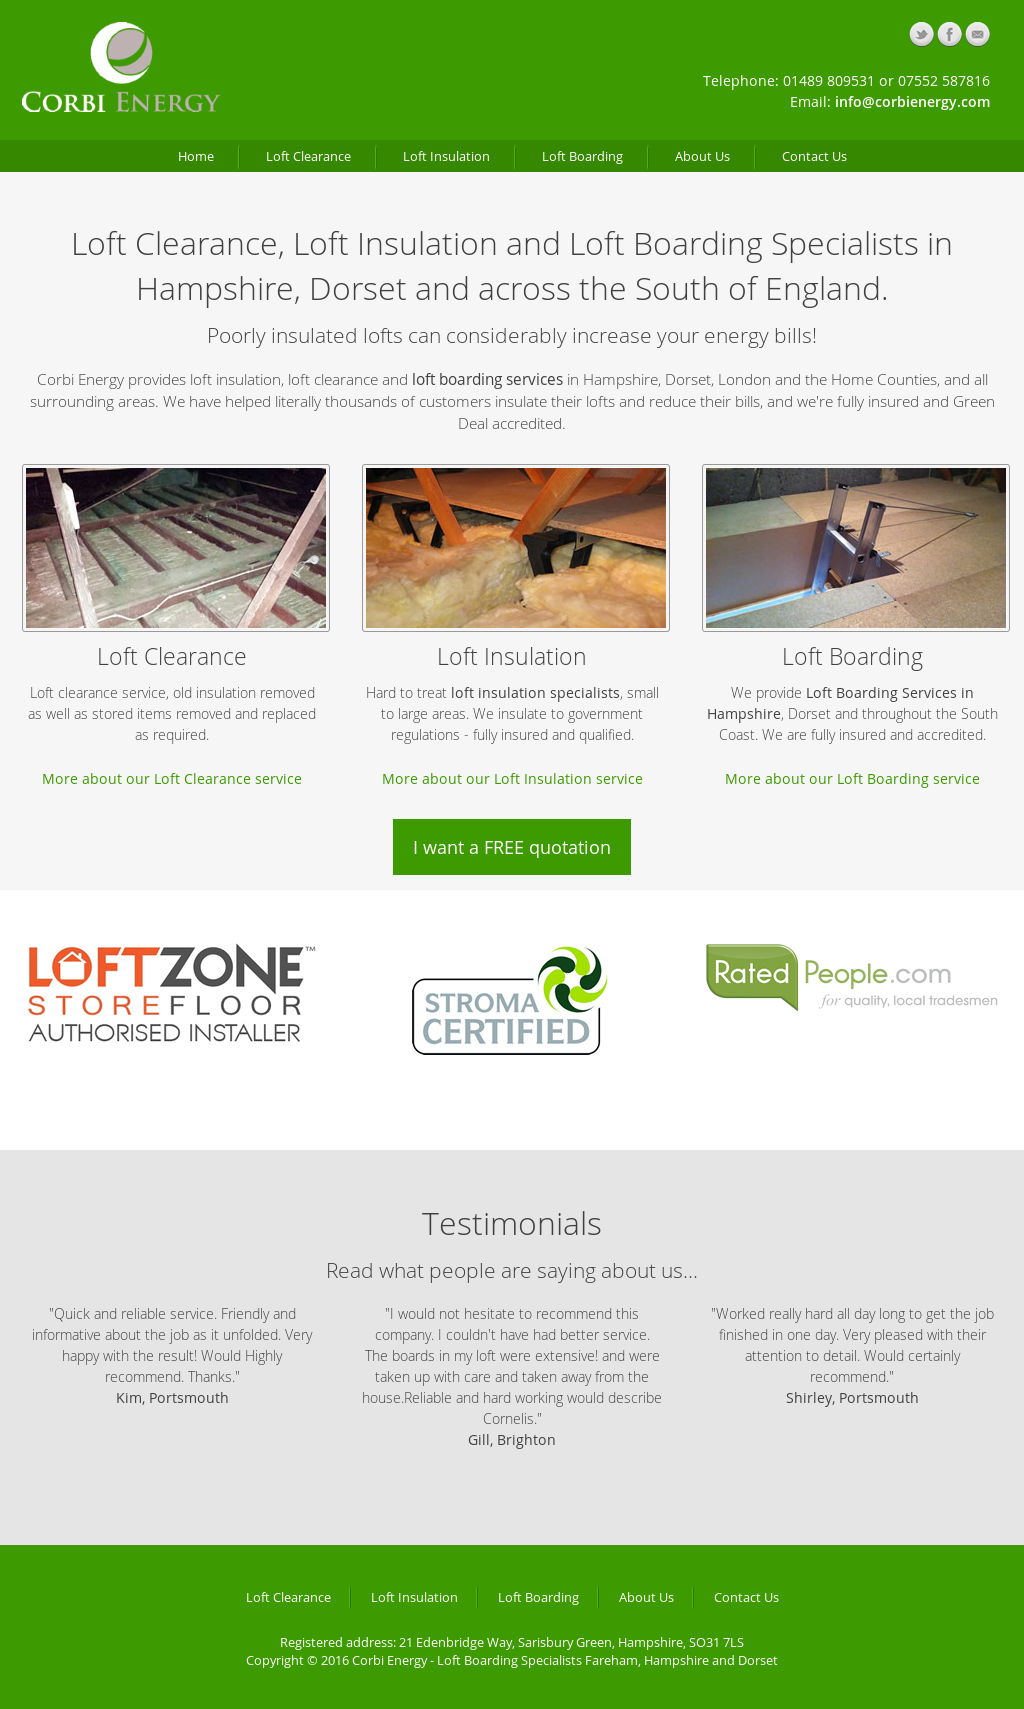 Corbi Energy Competitors, Revenue and Employees - Owler